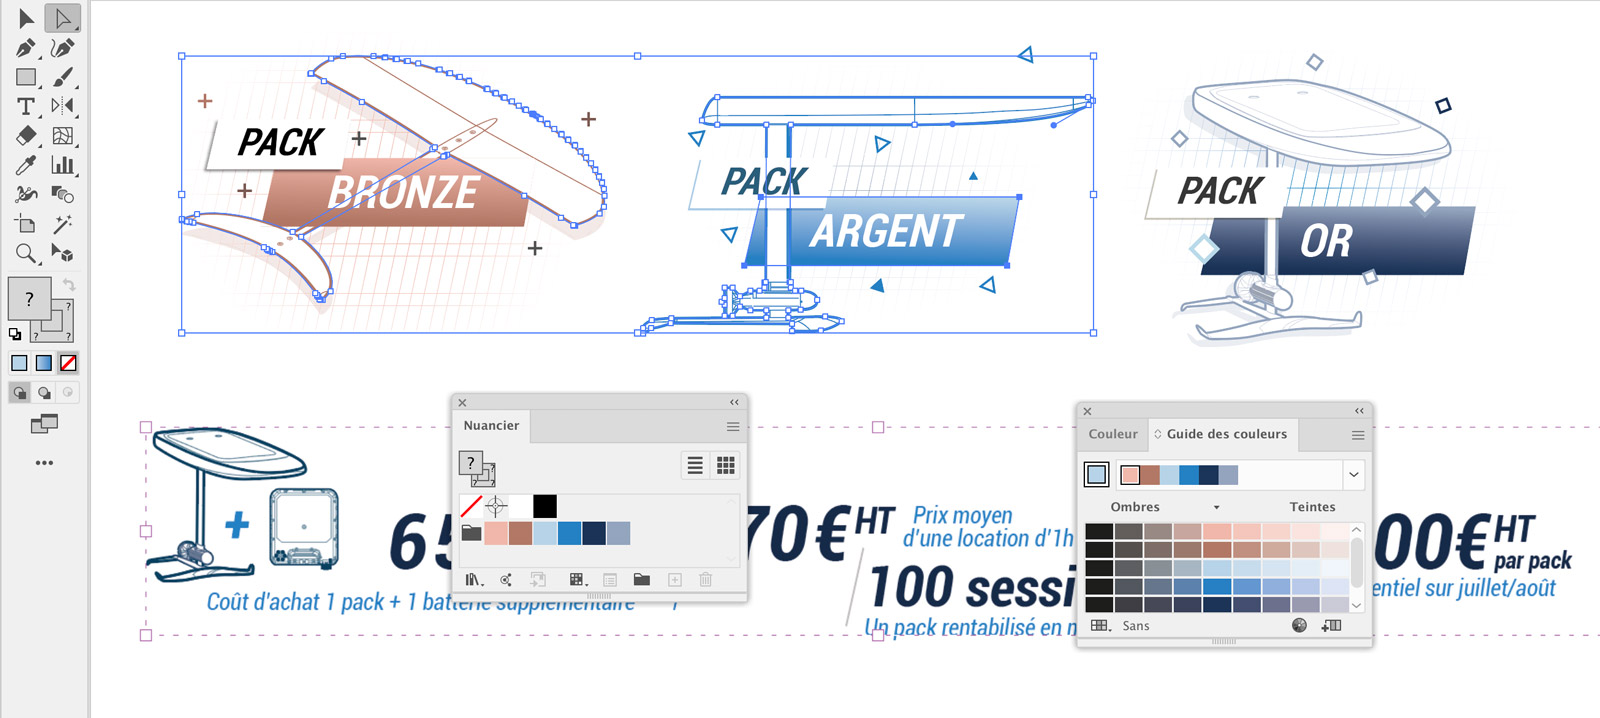 Créations vectorielles catalogue Decathlon Efoil - WakeBoard Illustrator